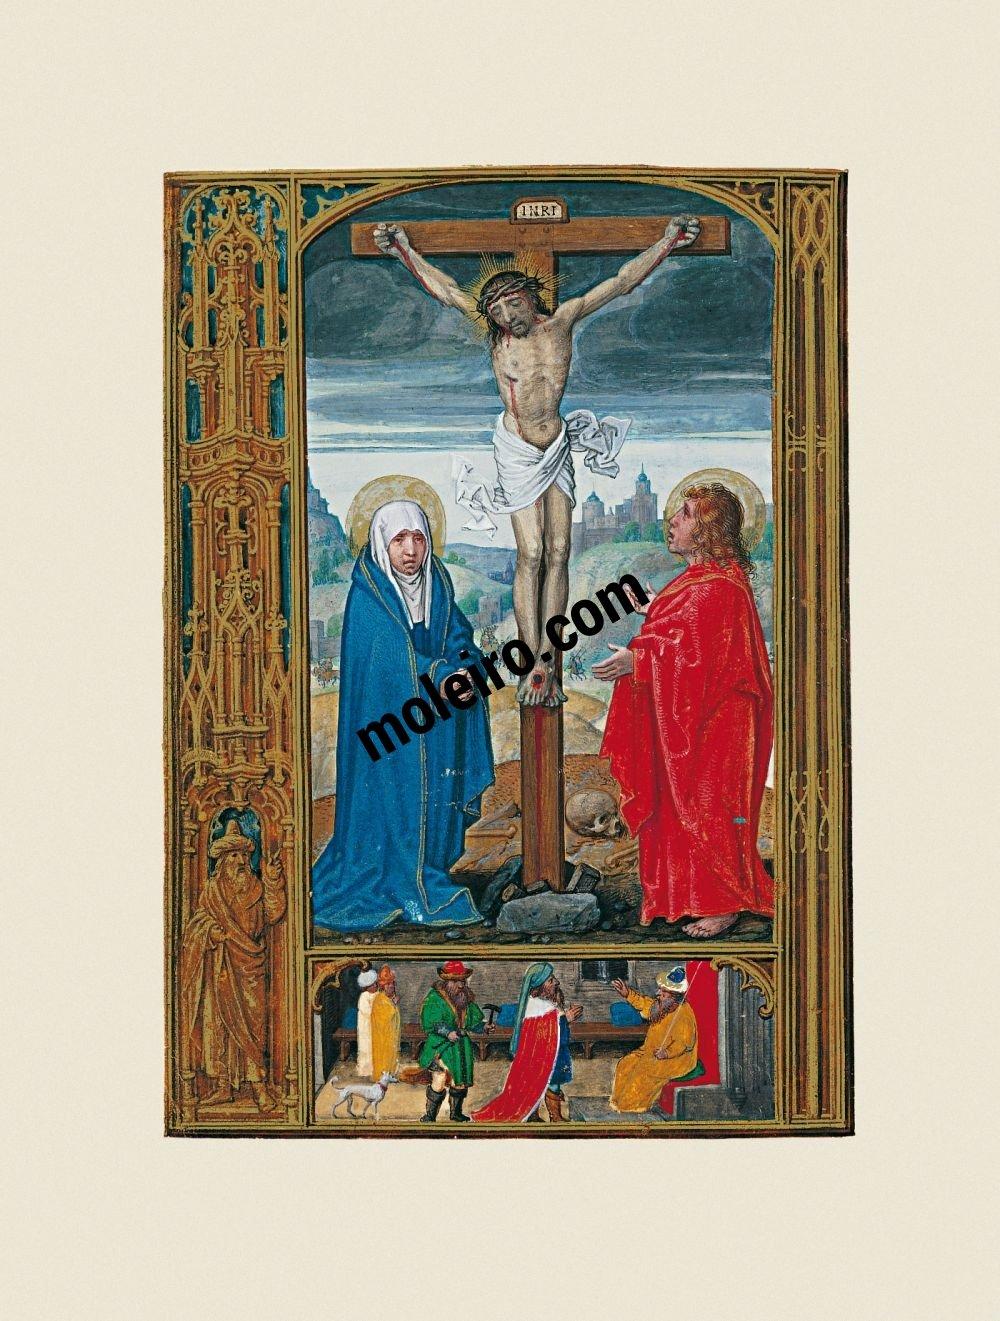 Libro del Golf  f. 12v, Crucifixión